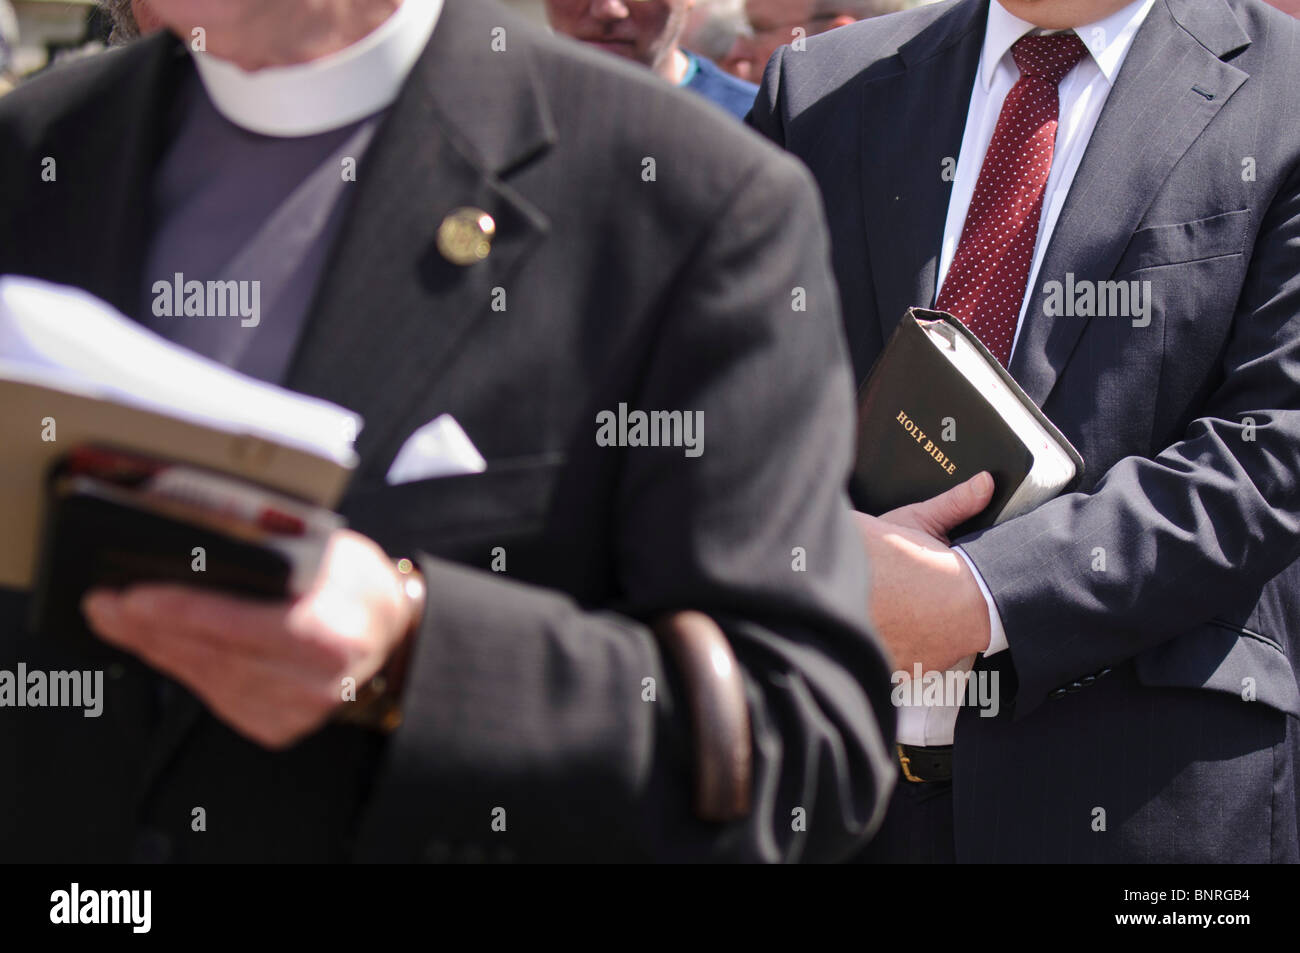 Les bibles protestantes ministres occupant Banque D'Images